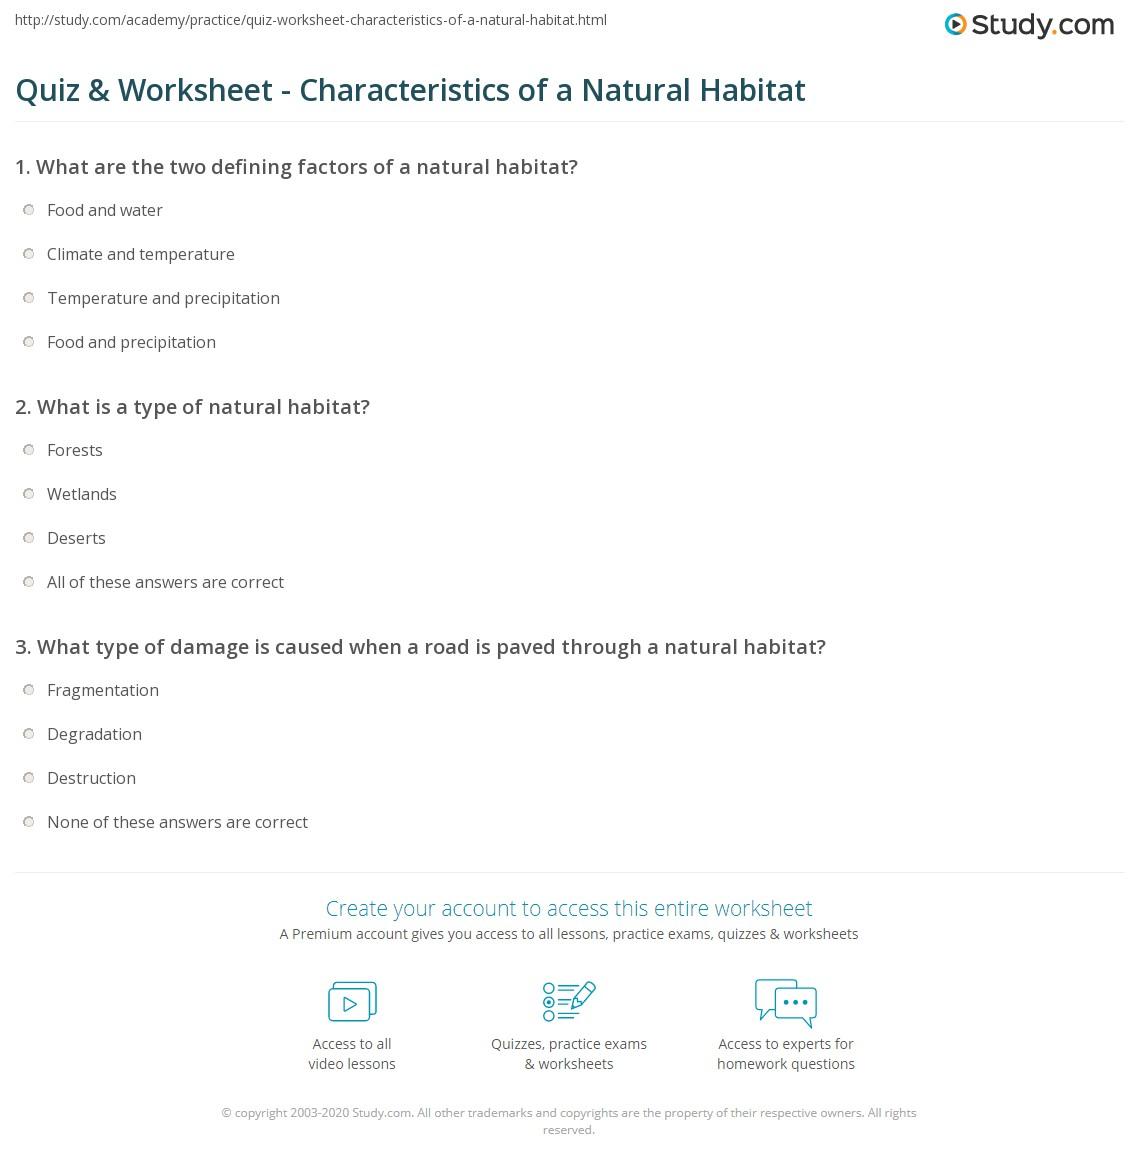 worksheet Habitat Worksheet quiz worksheet characteristics of a natural habitat study com print what is definition destruction worksheet